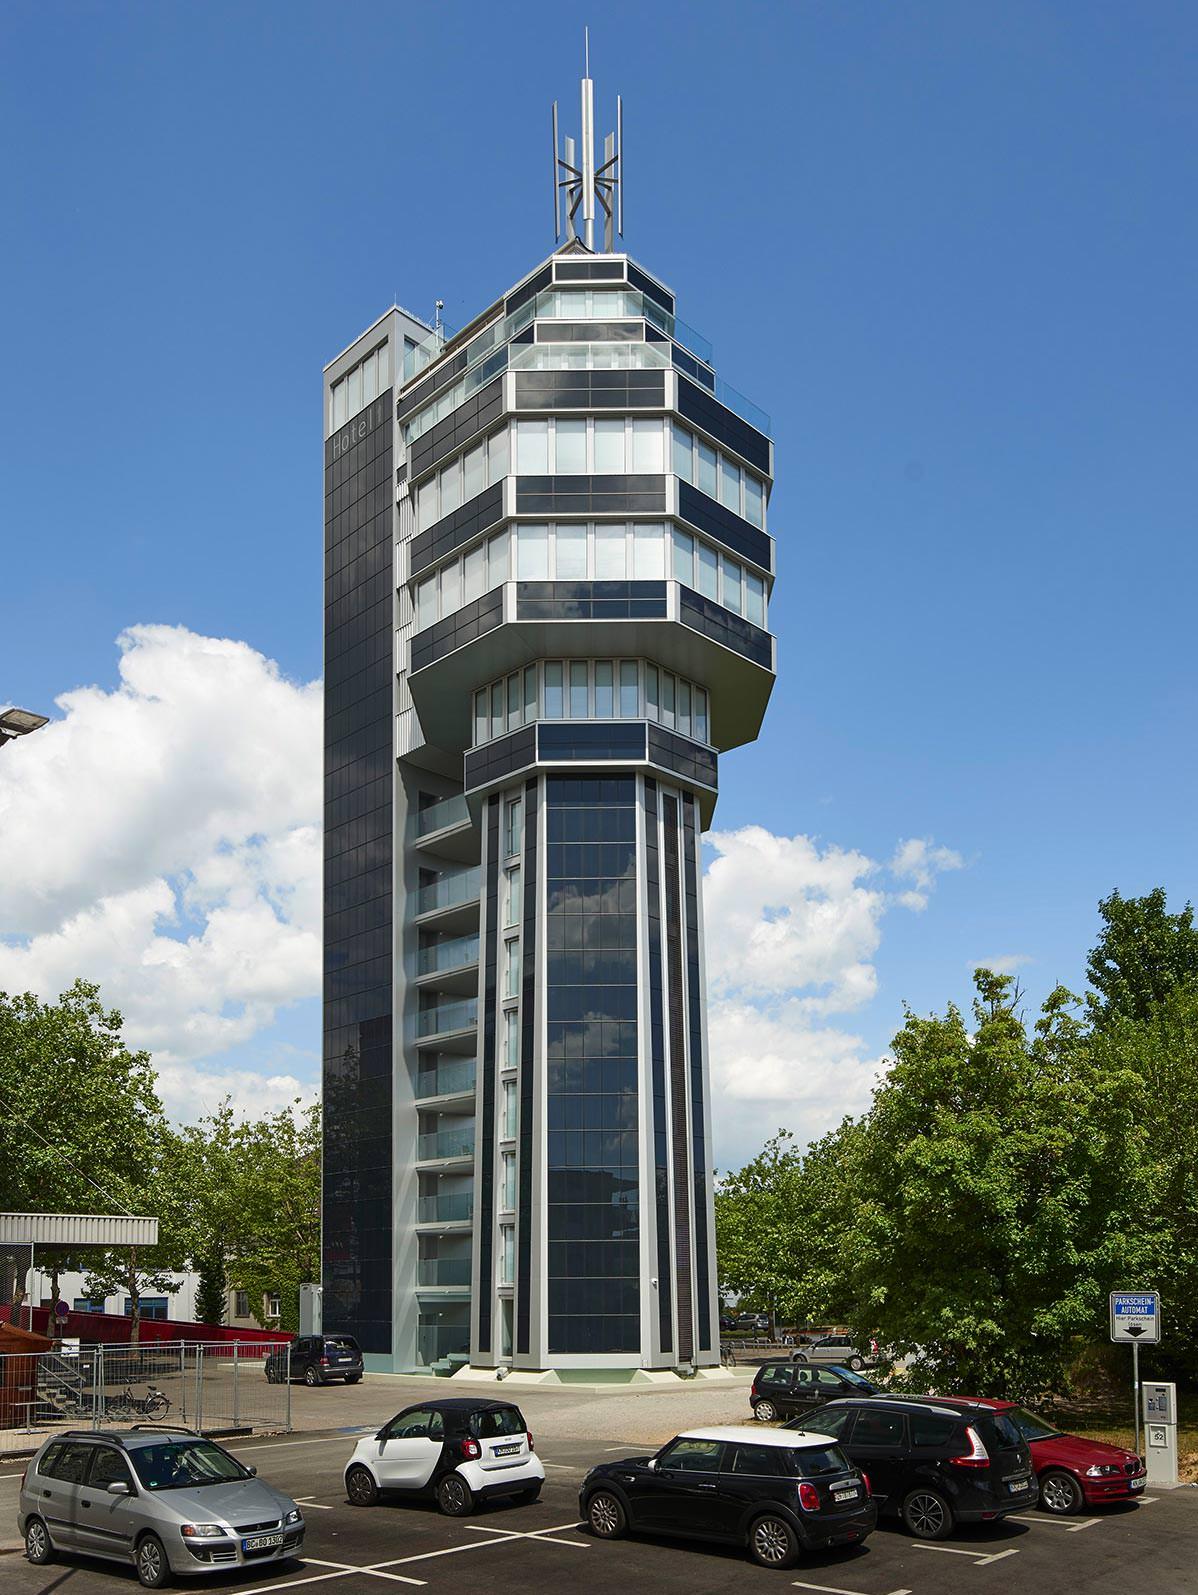 Casino Radolfzell